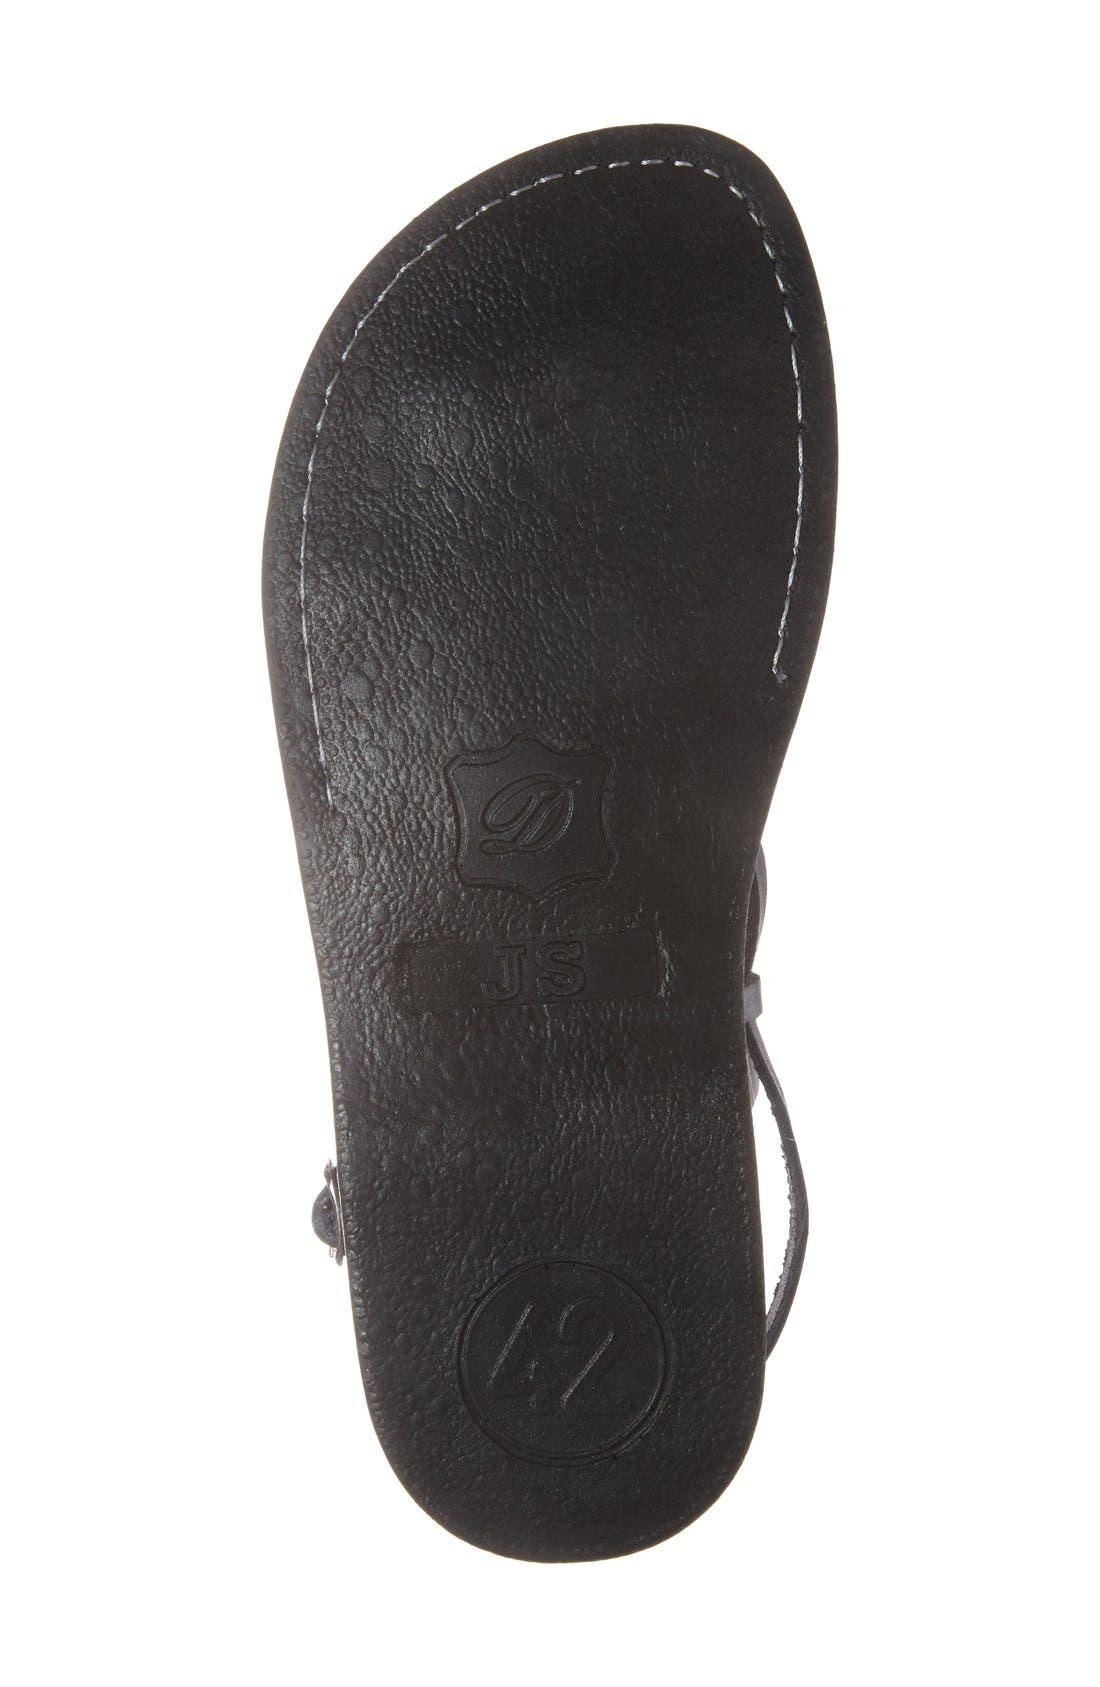 'The Good Shepherd' Leather Sandal,                             Alternate thumbnail 4, color,                             GREY LEATHER